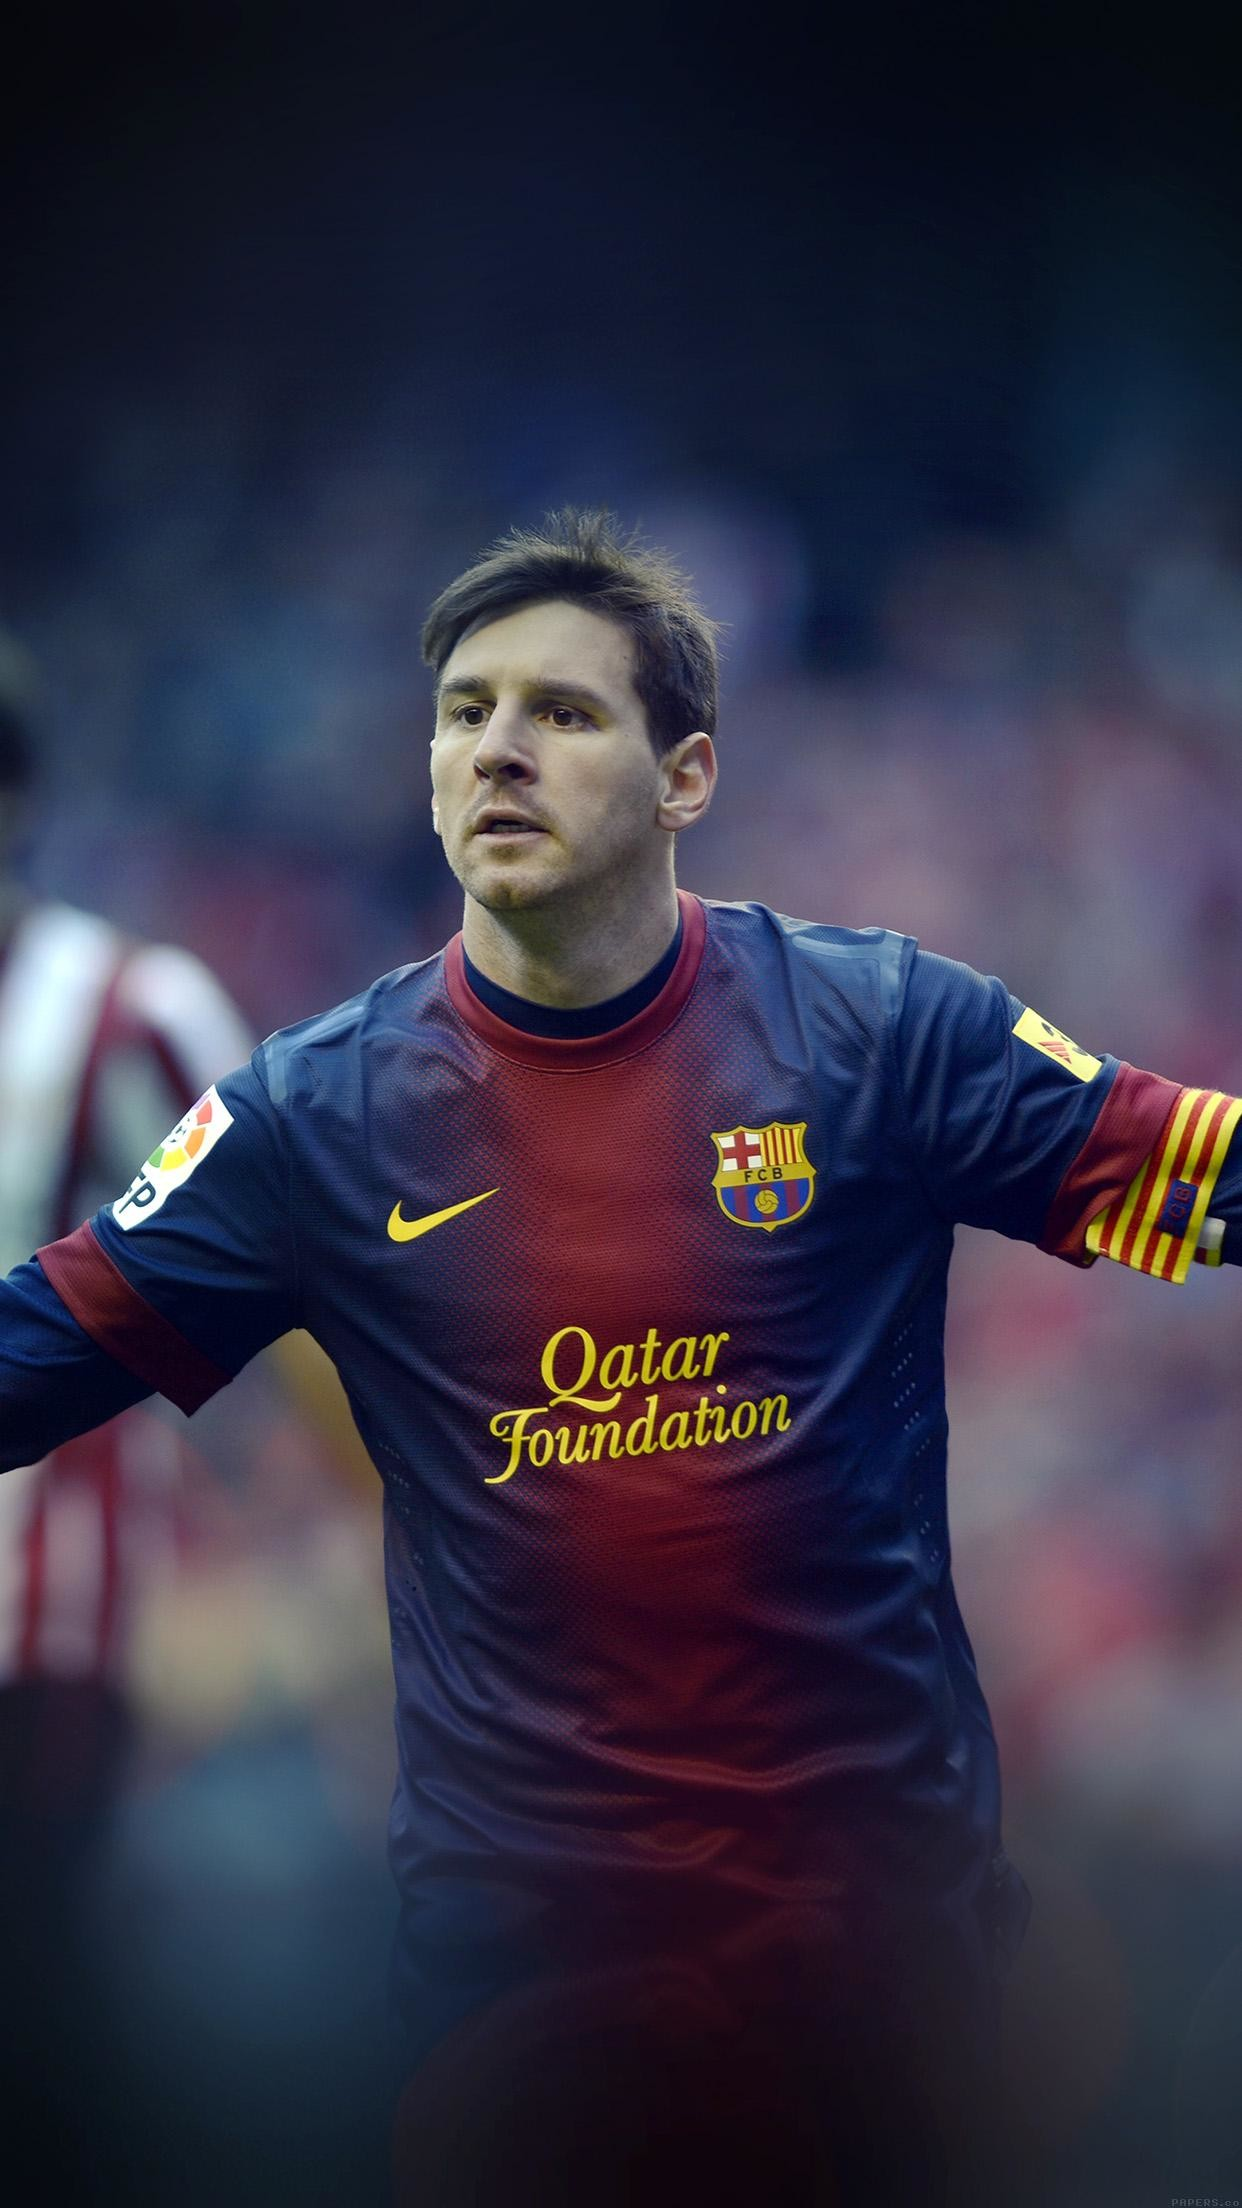 Messi Fc Barcelona Soccer Sports